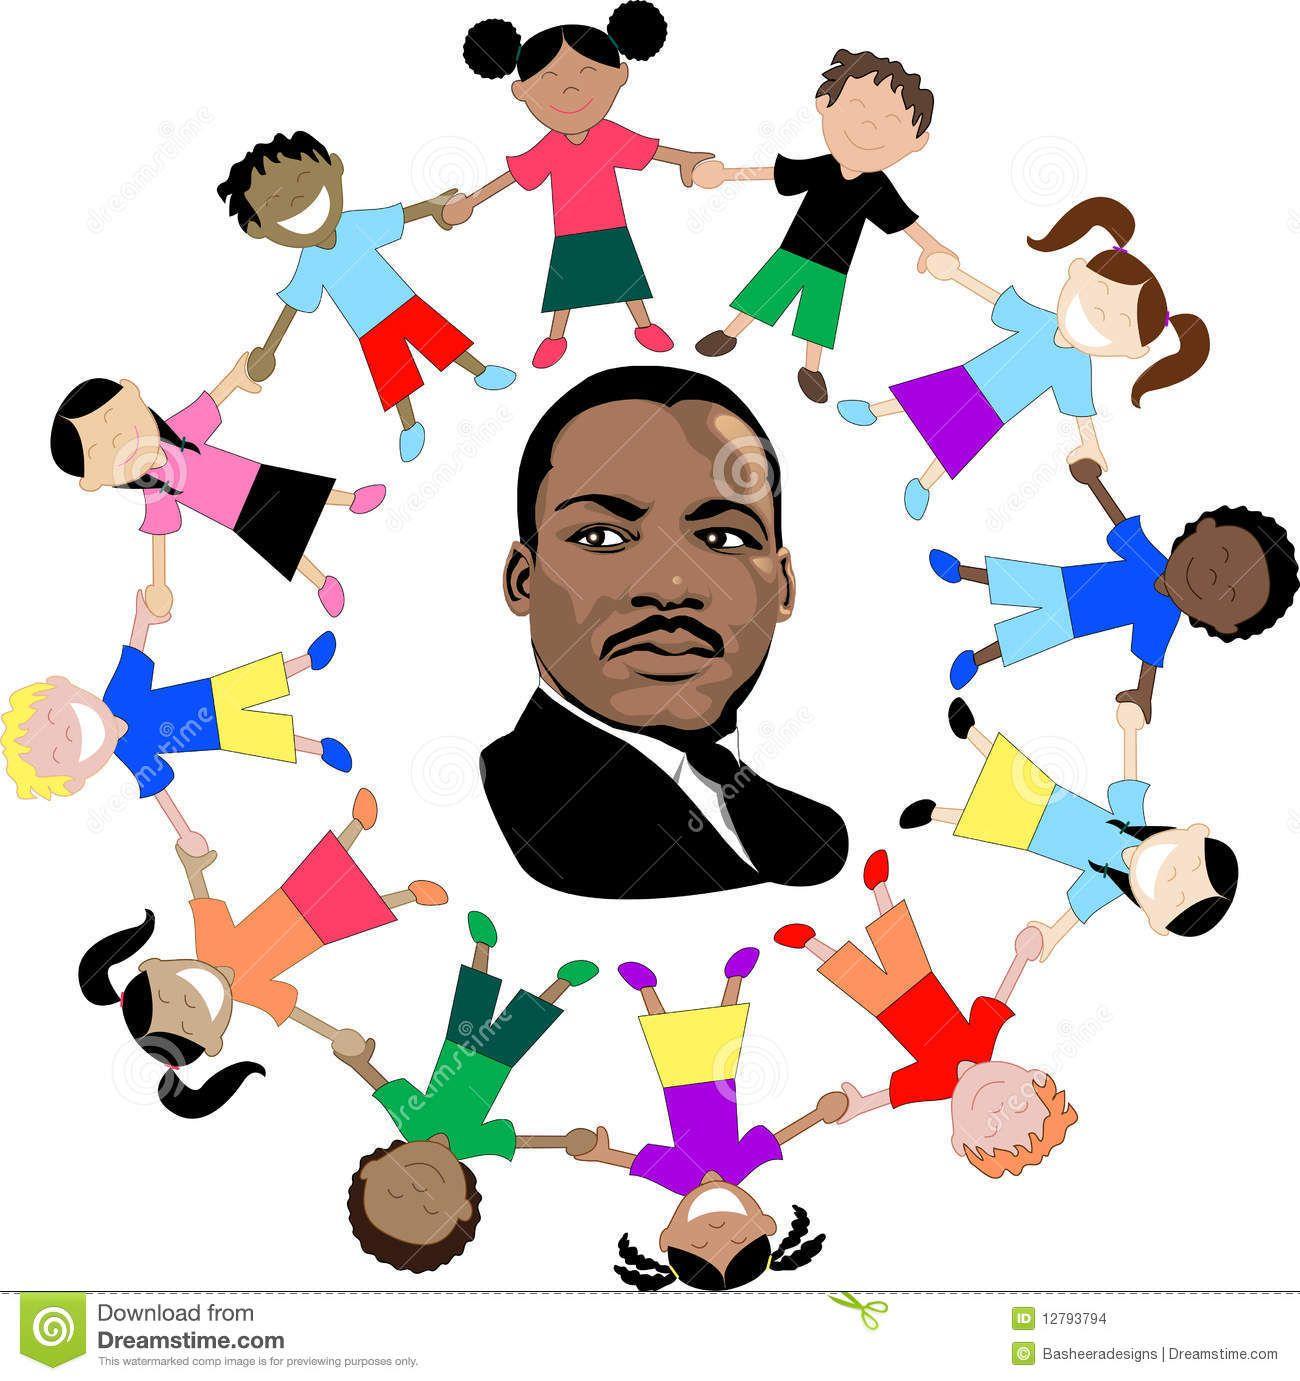 imagenes de Martin Luther King Jr. - Google Search